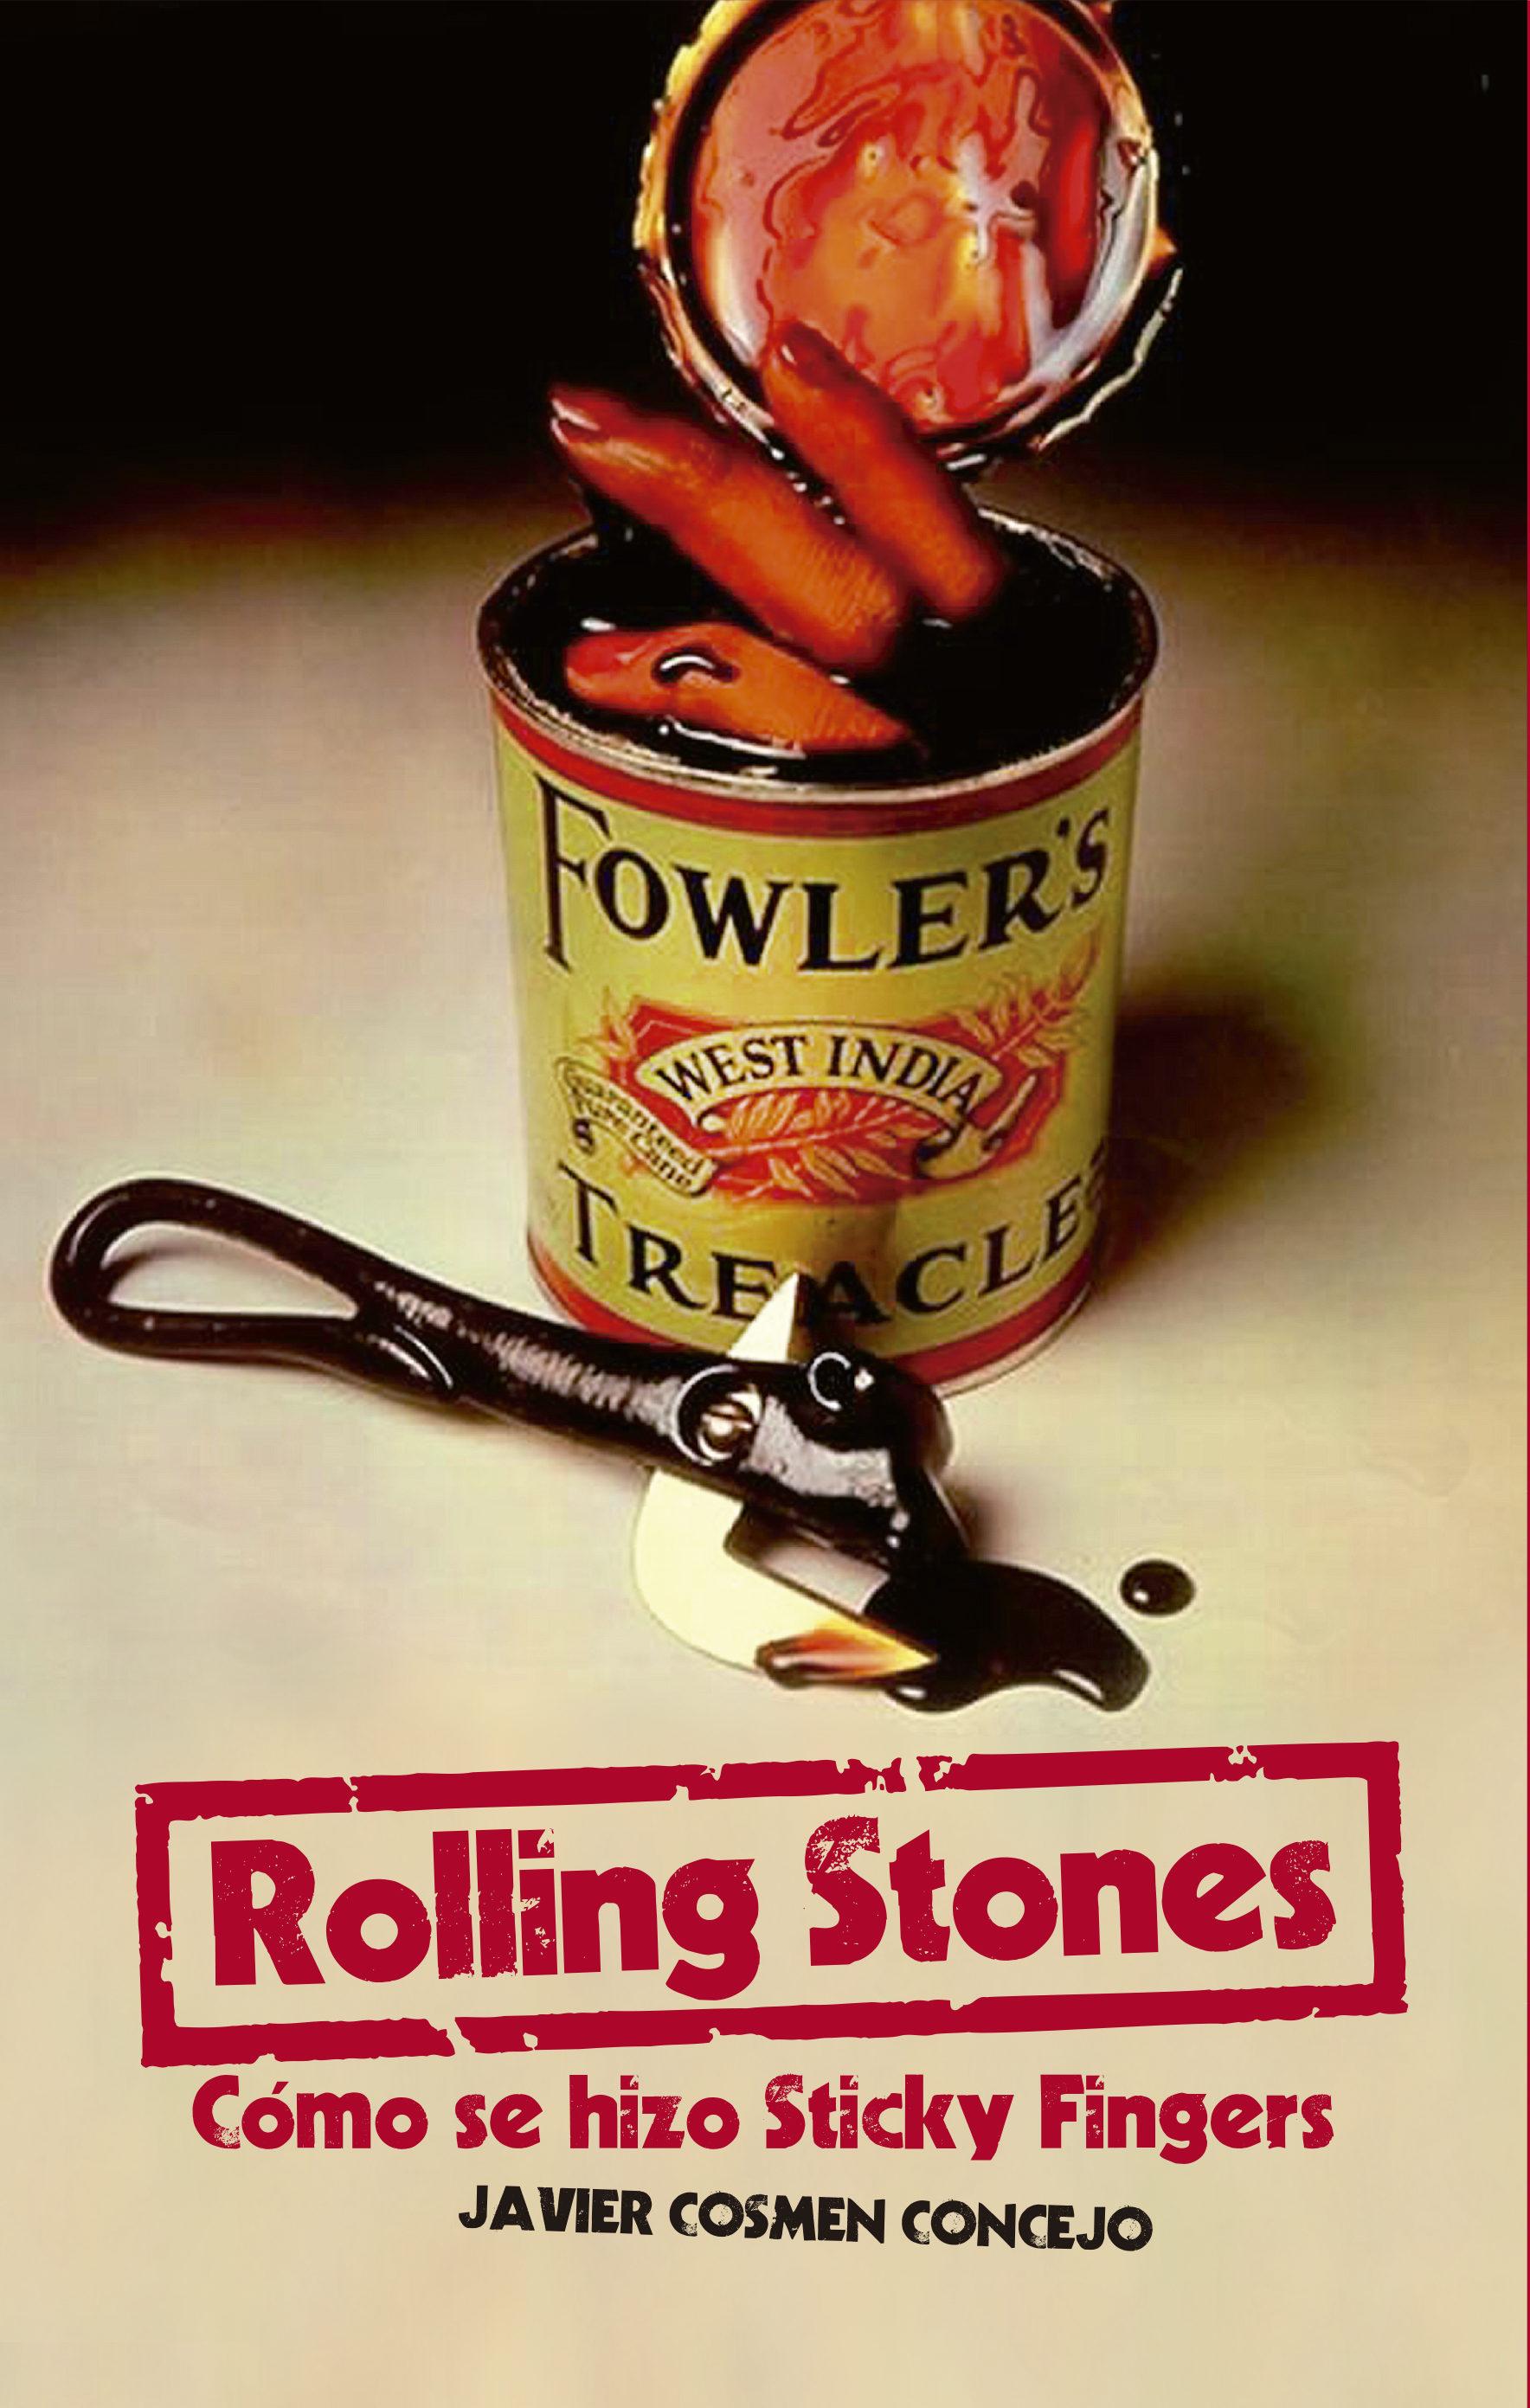 rolling stones: cómo se hizo sticky fingers-javier cosmen concejo-9788415405849